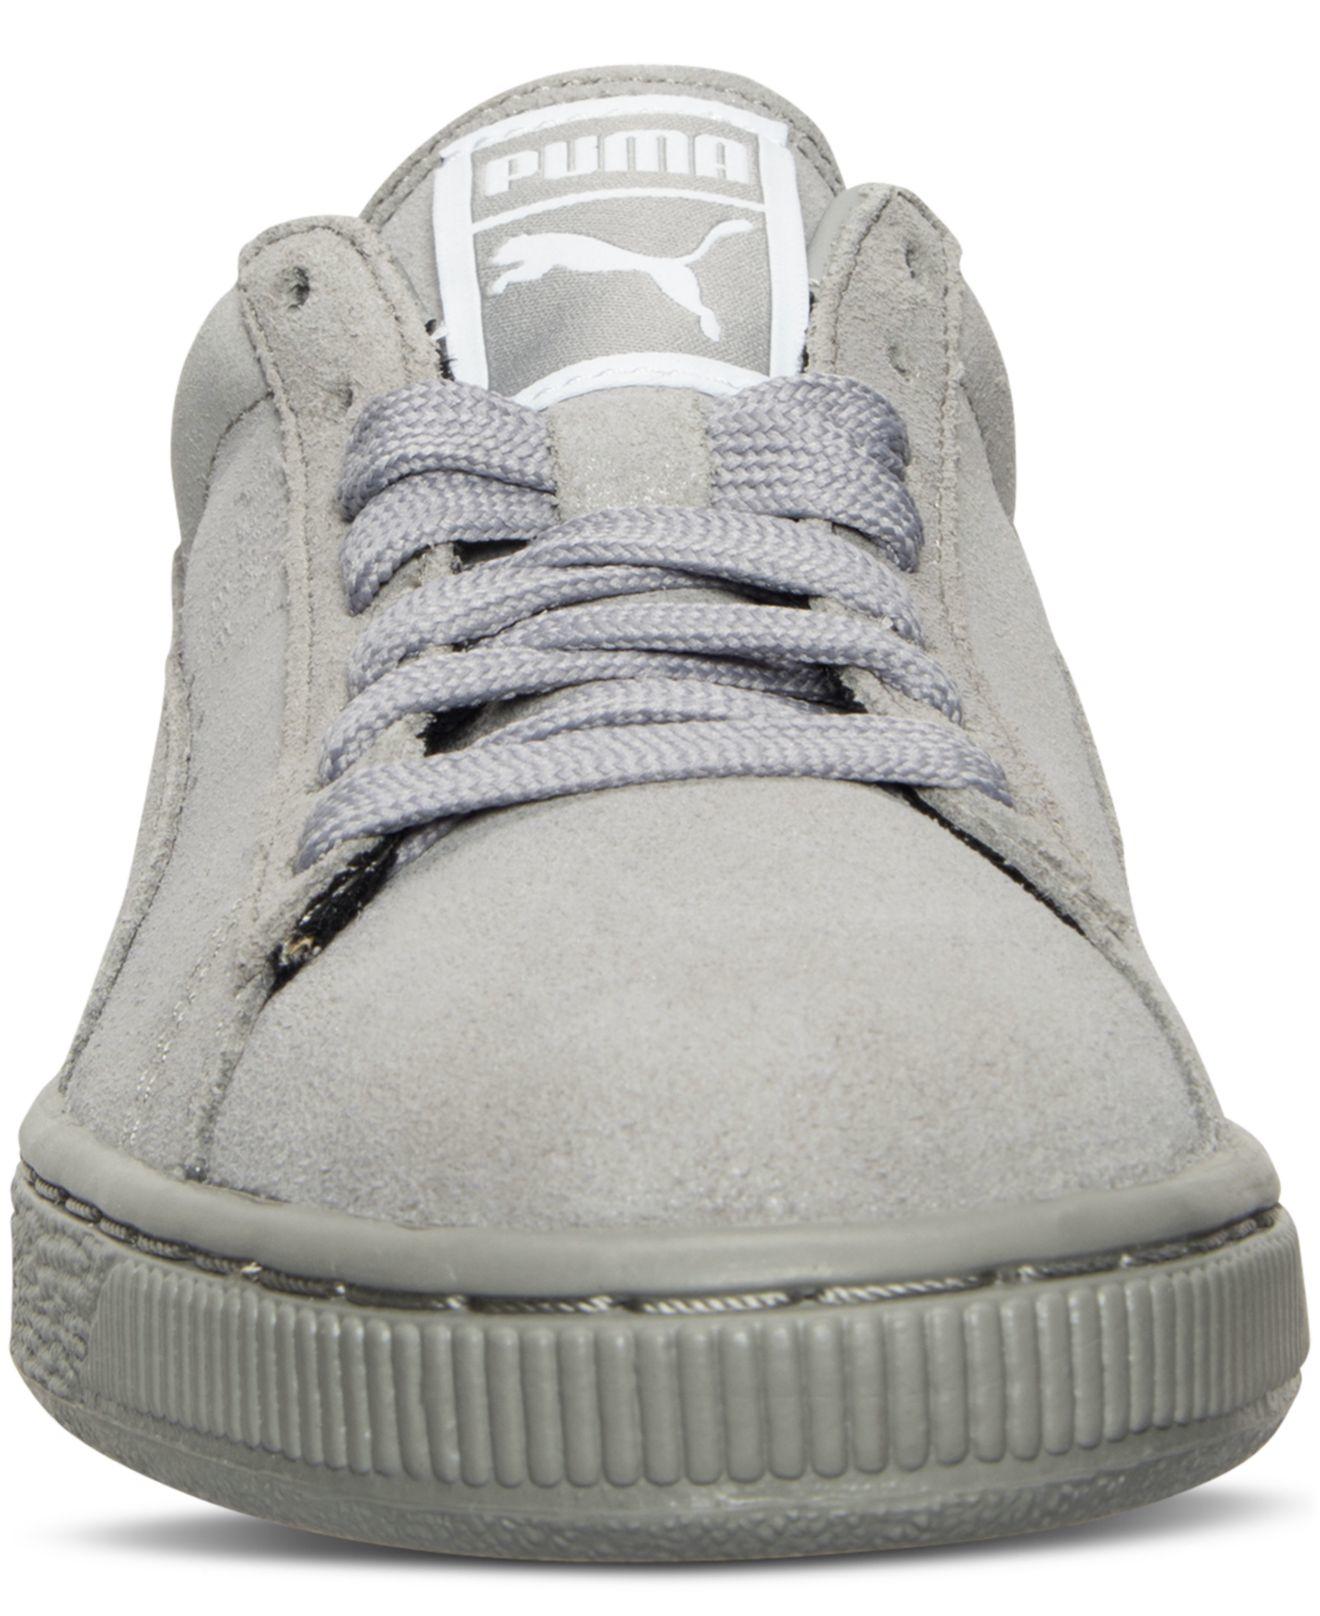 Finish Shine Gray Women's Line Suede Sneakers Puma Casual From Classic Matteamp; 0nPk8wO